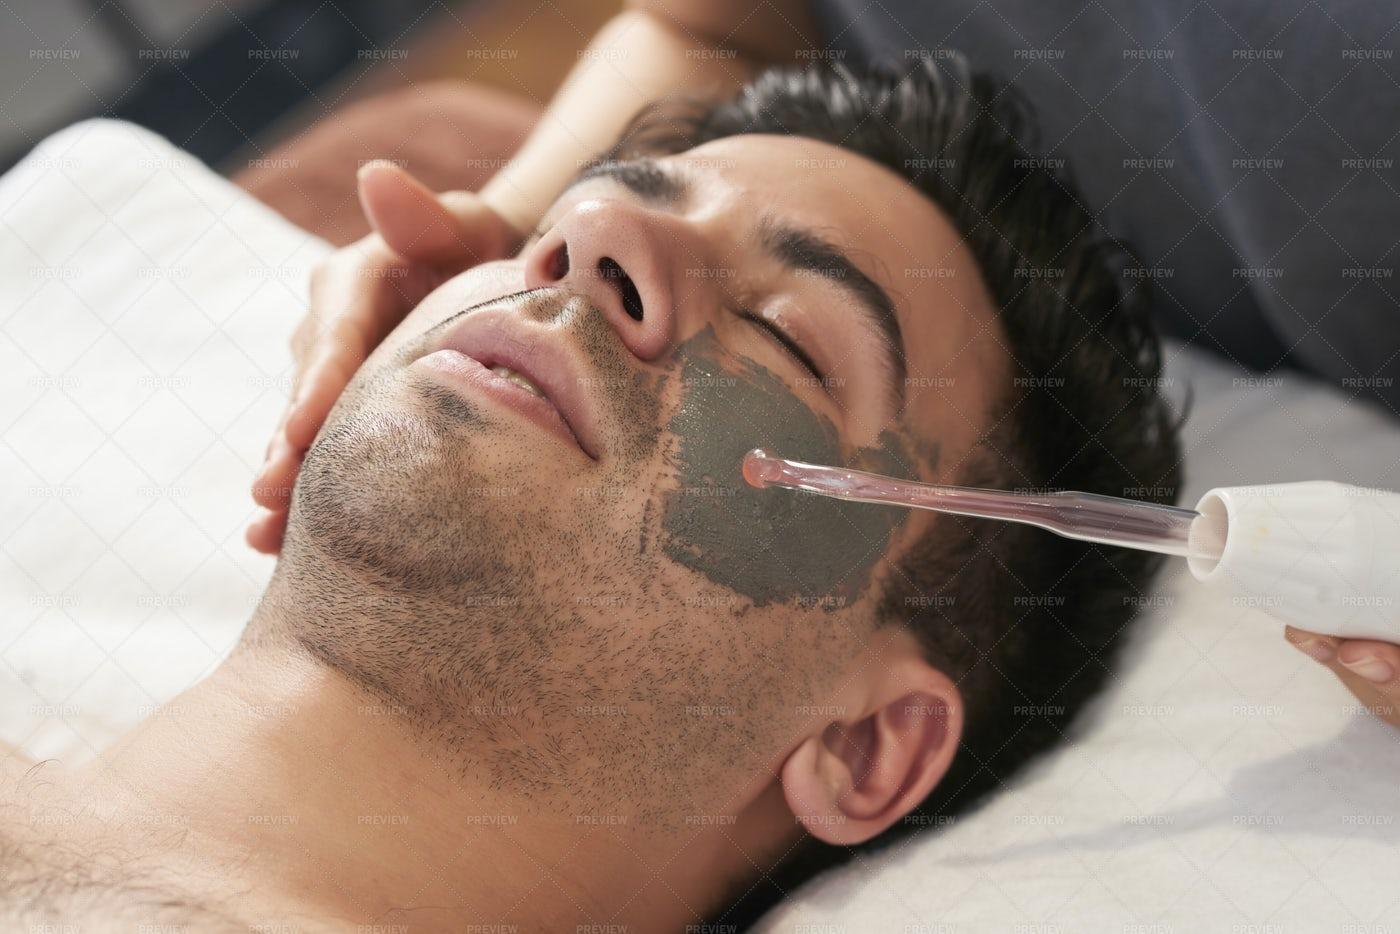 Rejuvenation Procedure For Man: Stock Photos